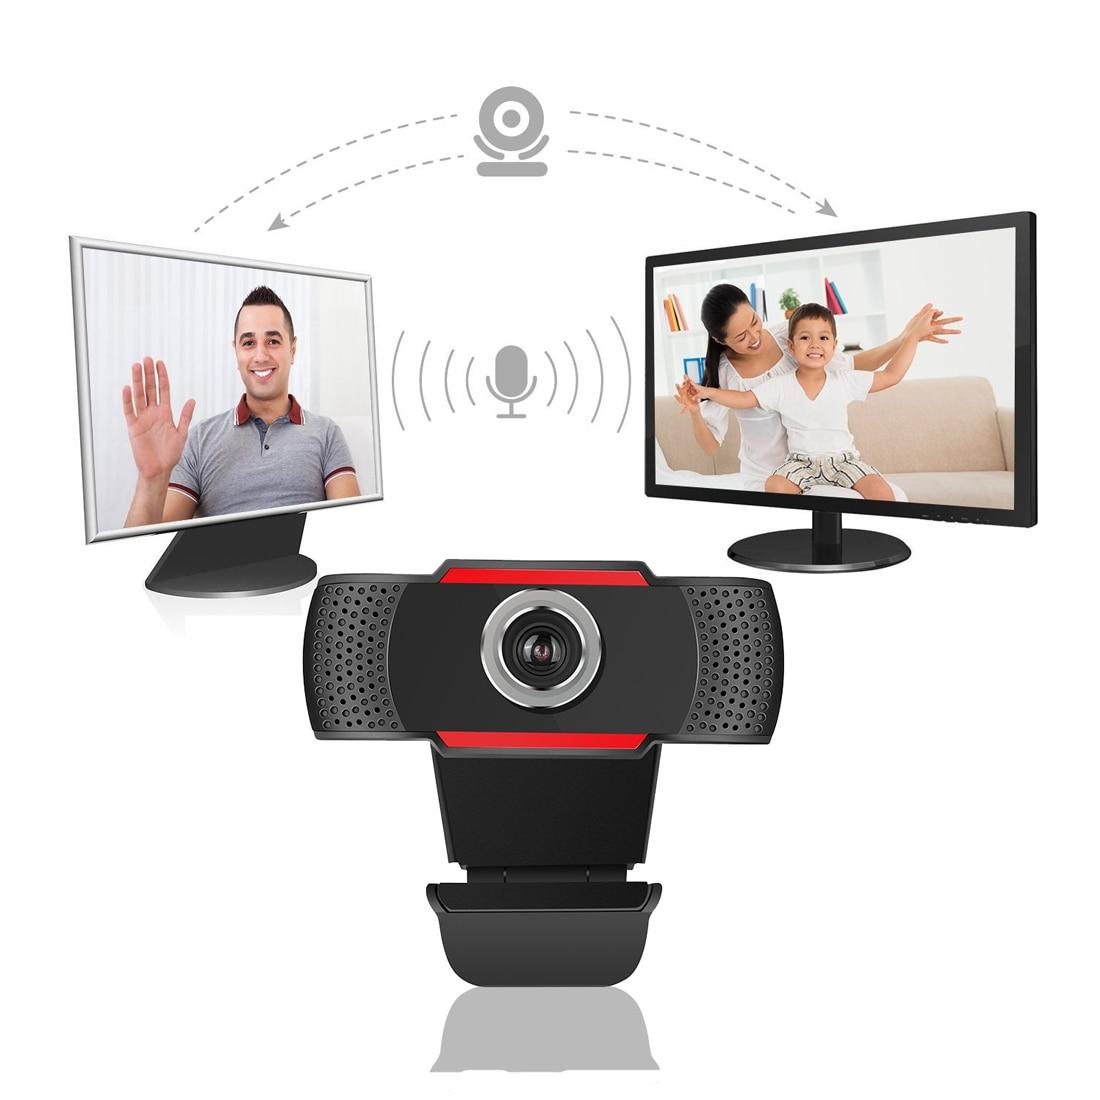 USB Web Cam Webcam HD 300 megapíxeles de cámara de la PC con la absorción micrófono MIC para Skype para Android TV giratorio ordenador cámara